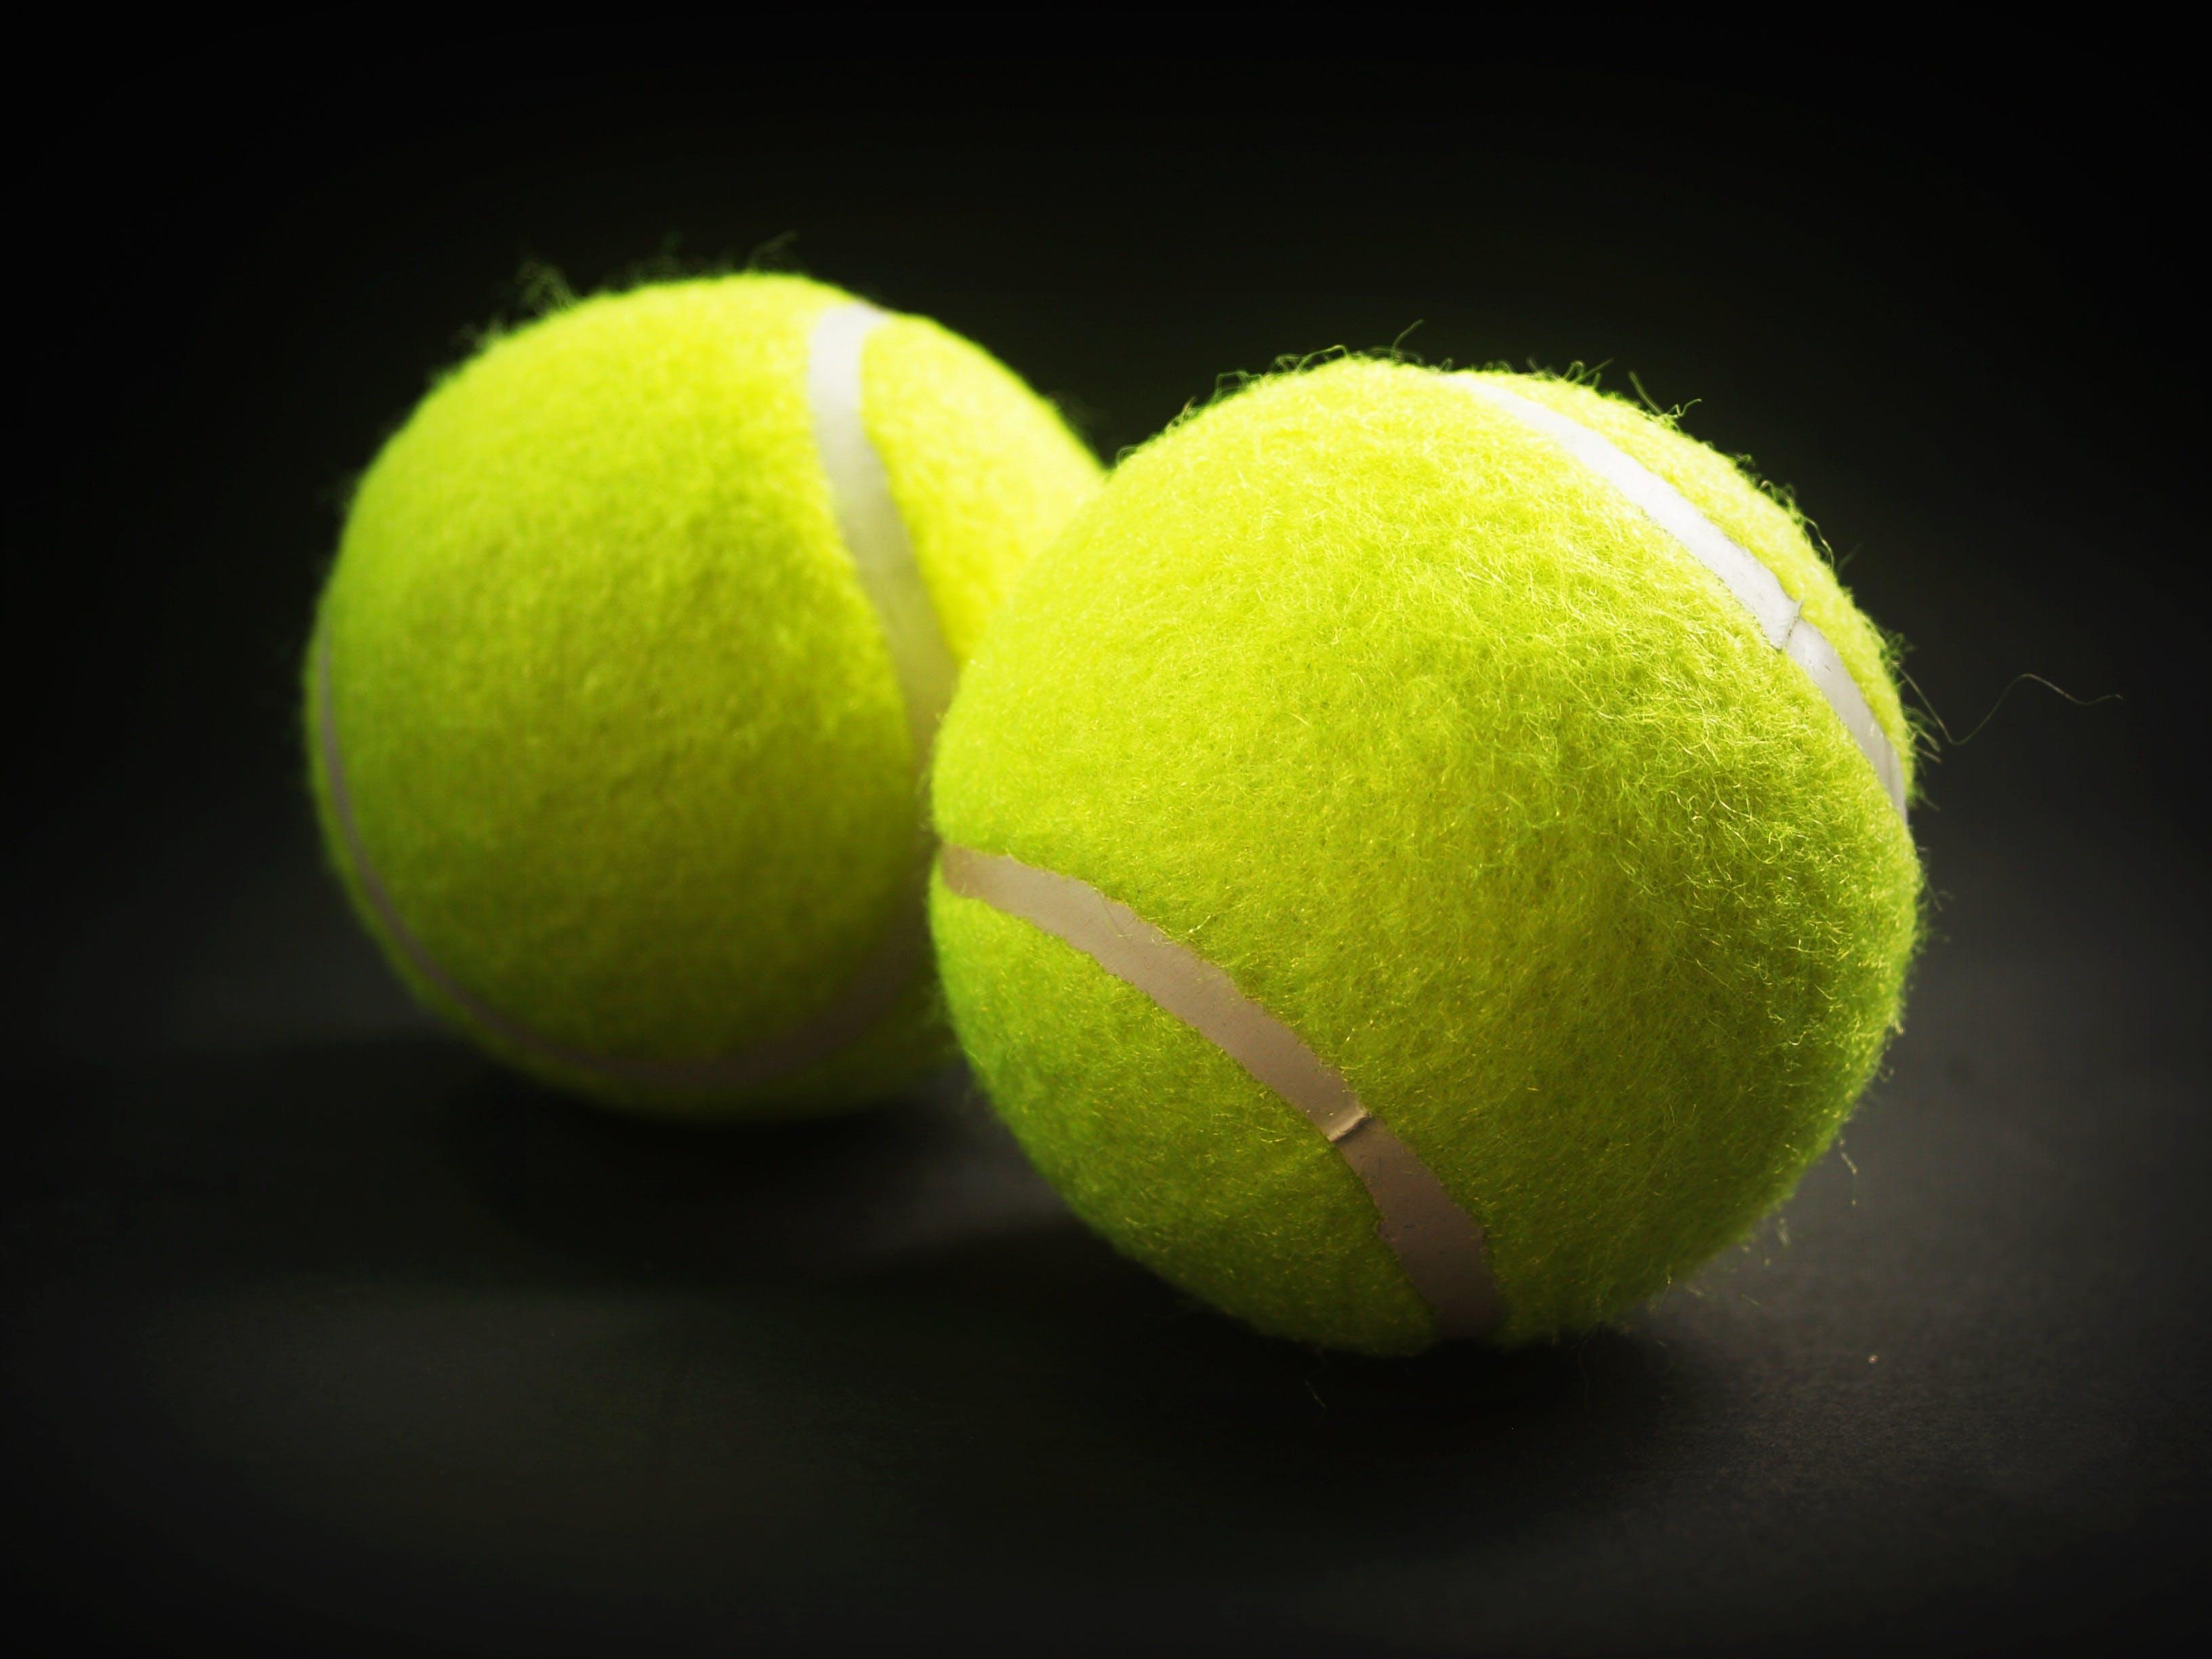 balls, bright, equipment